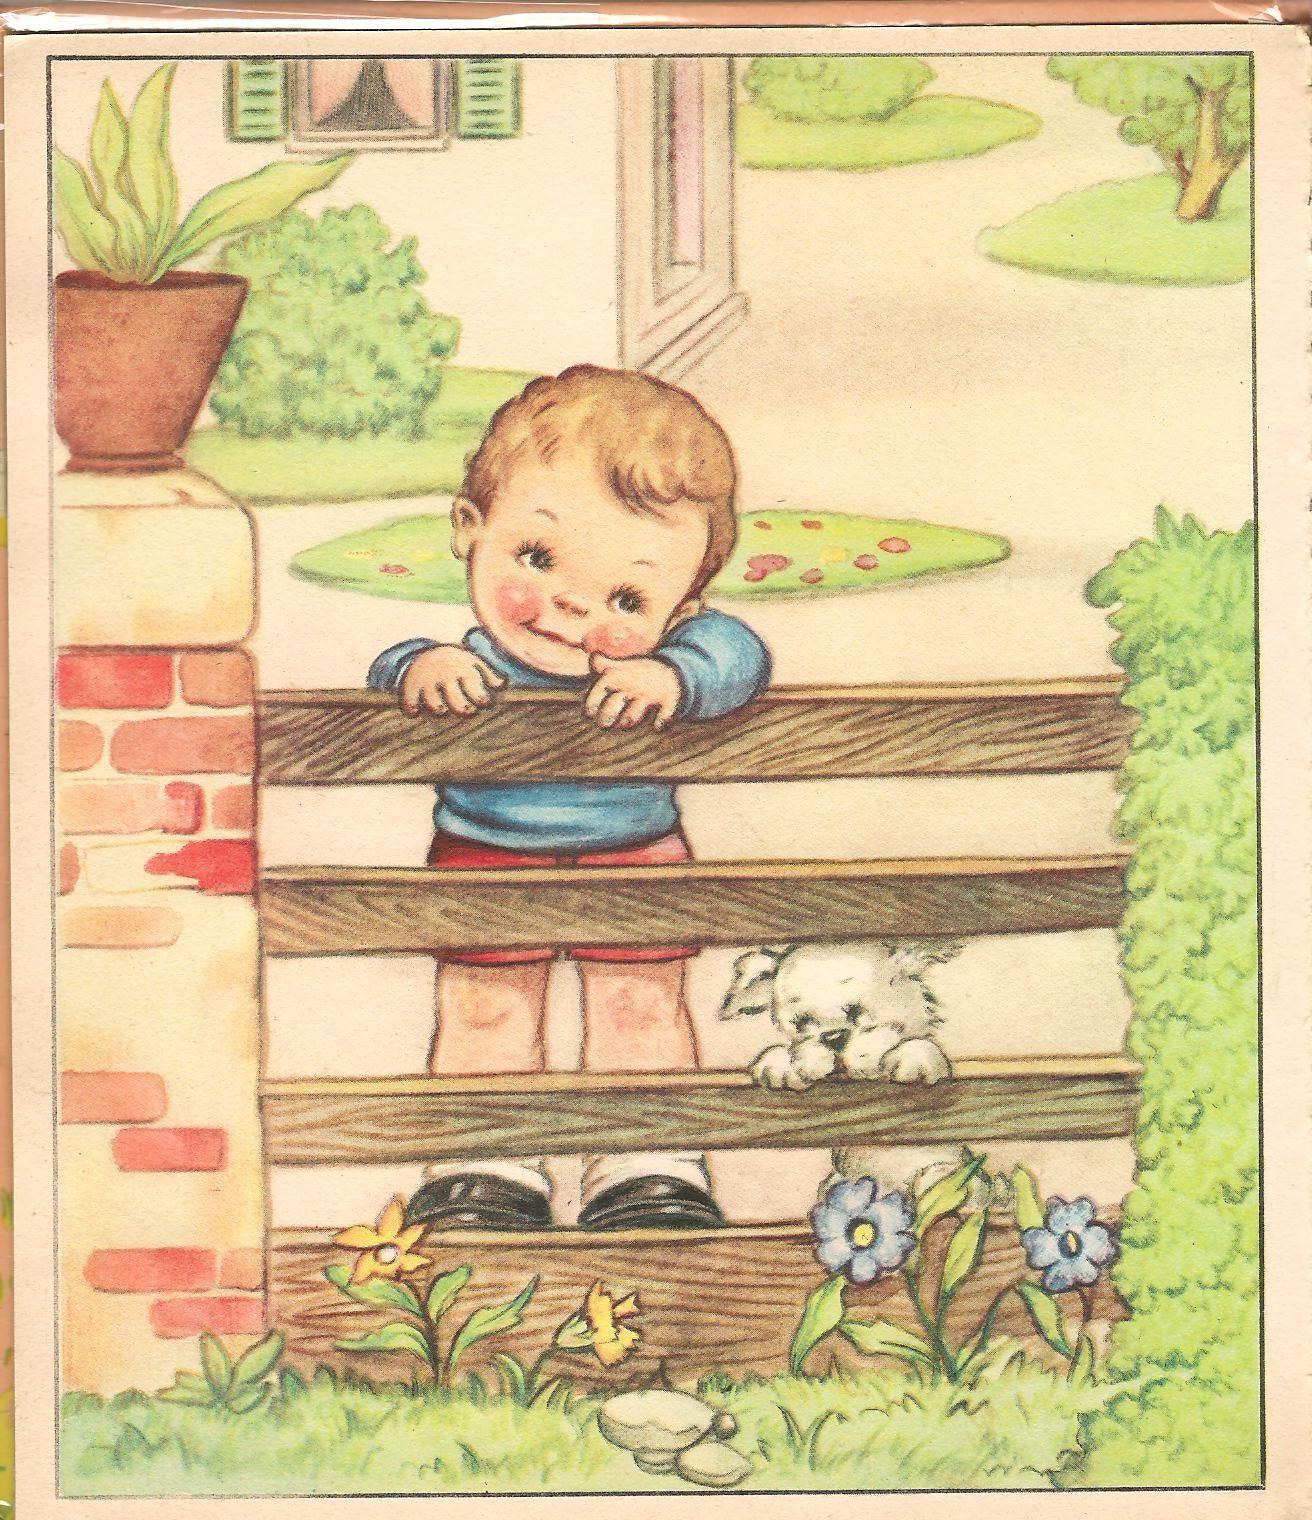 Ilclanmariapia i bambini di mariapia maria pia - Ilustraciones infantiles antiguas ...